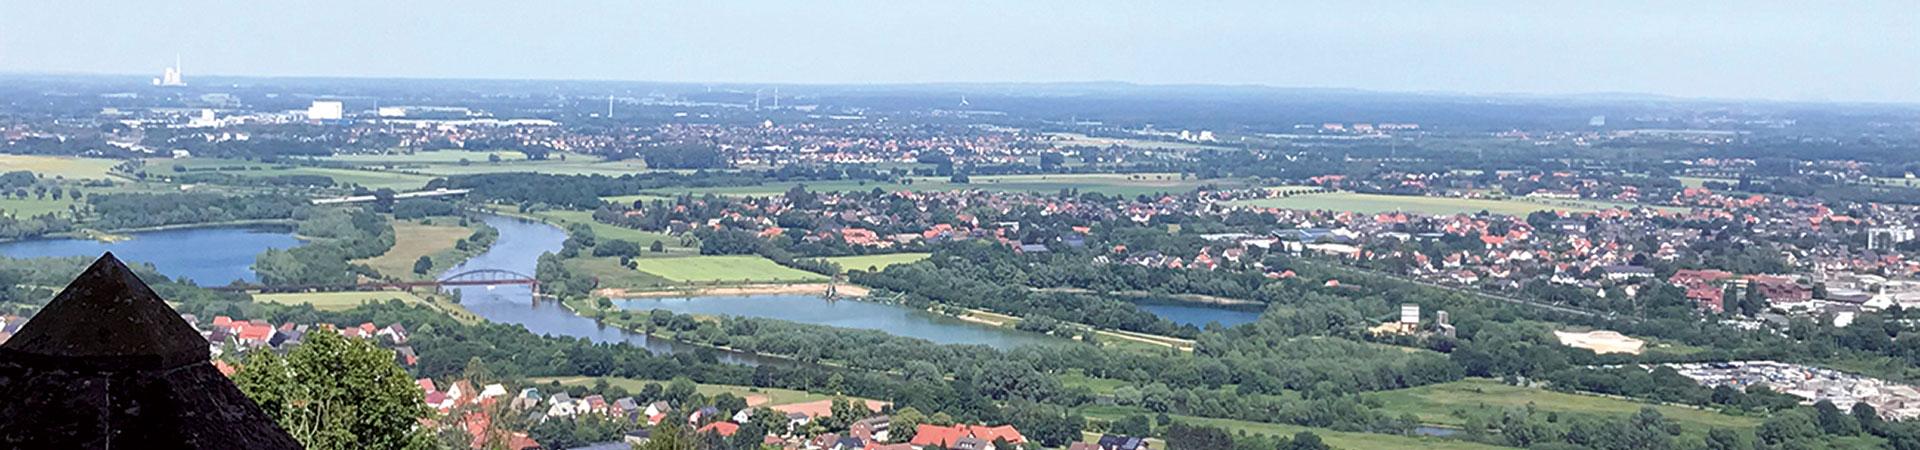 Titelbild-Aussicht-Porta-Westfalica-Leserreise-2018_26-06-2018_2159e